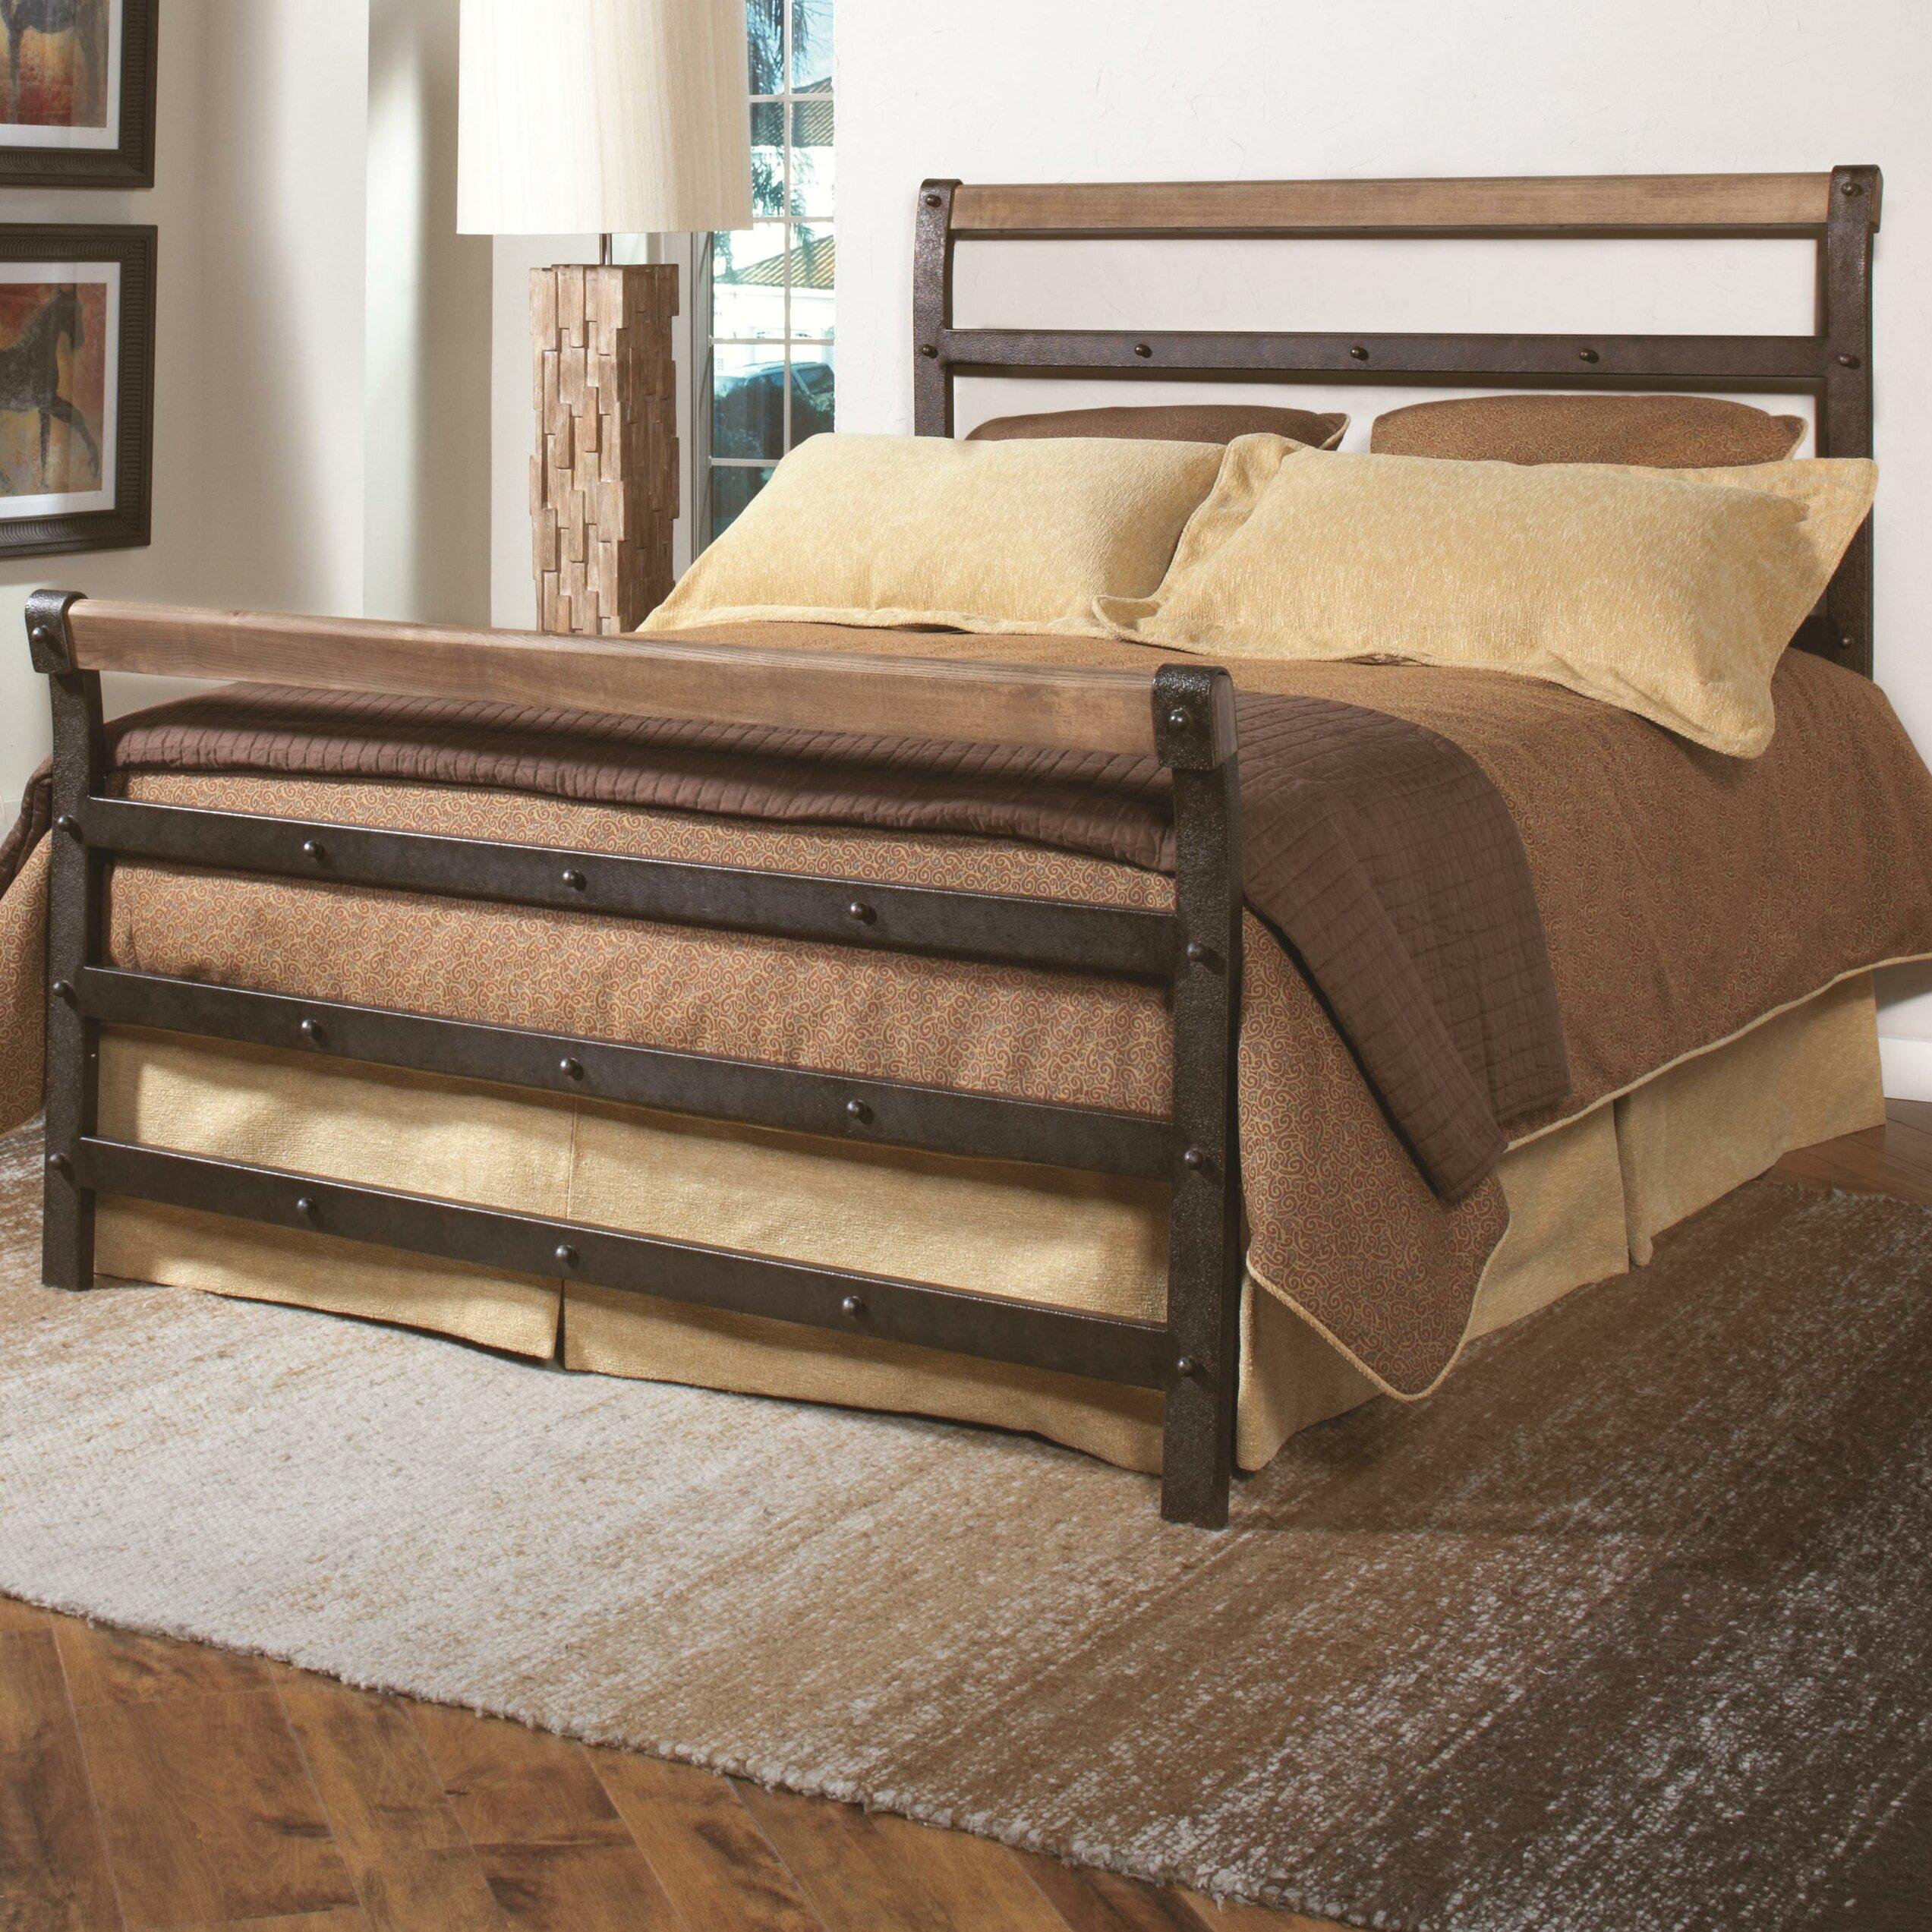 Wood Metal Bed : Largo Fargo Metal Wood Headboard and Footboard & Reviews  Wayfair